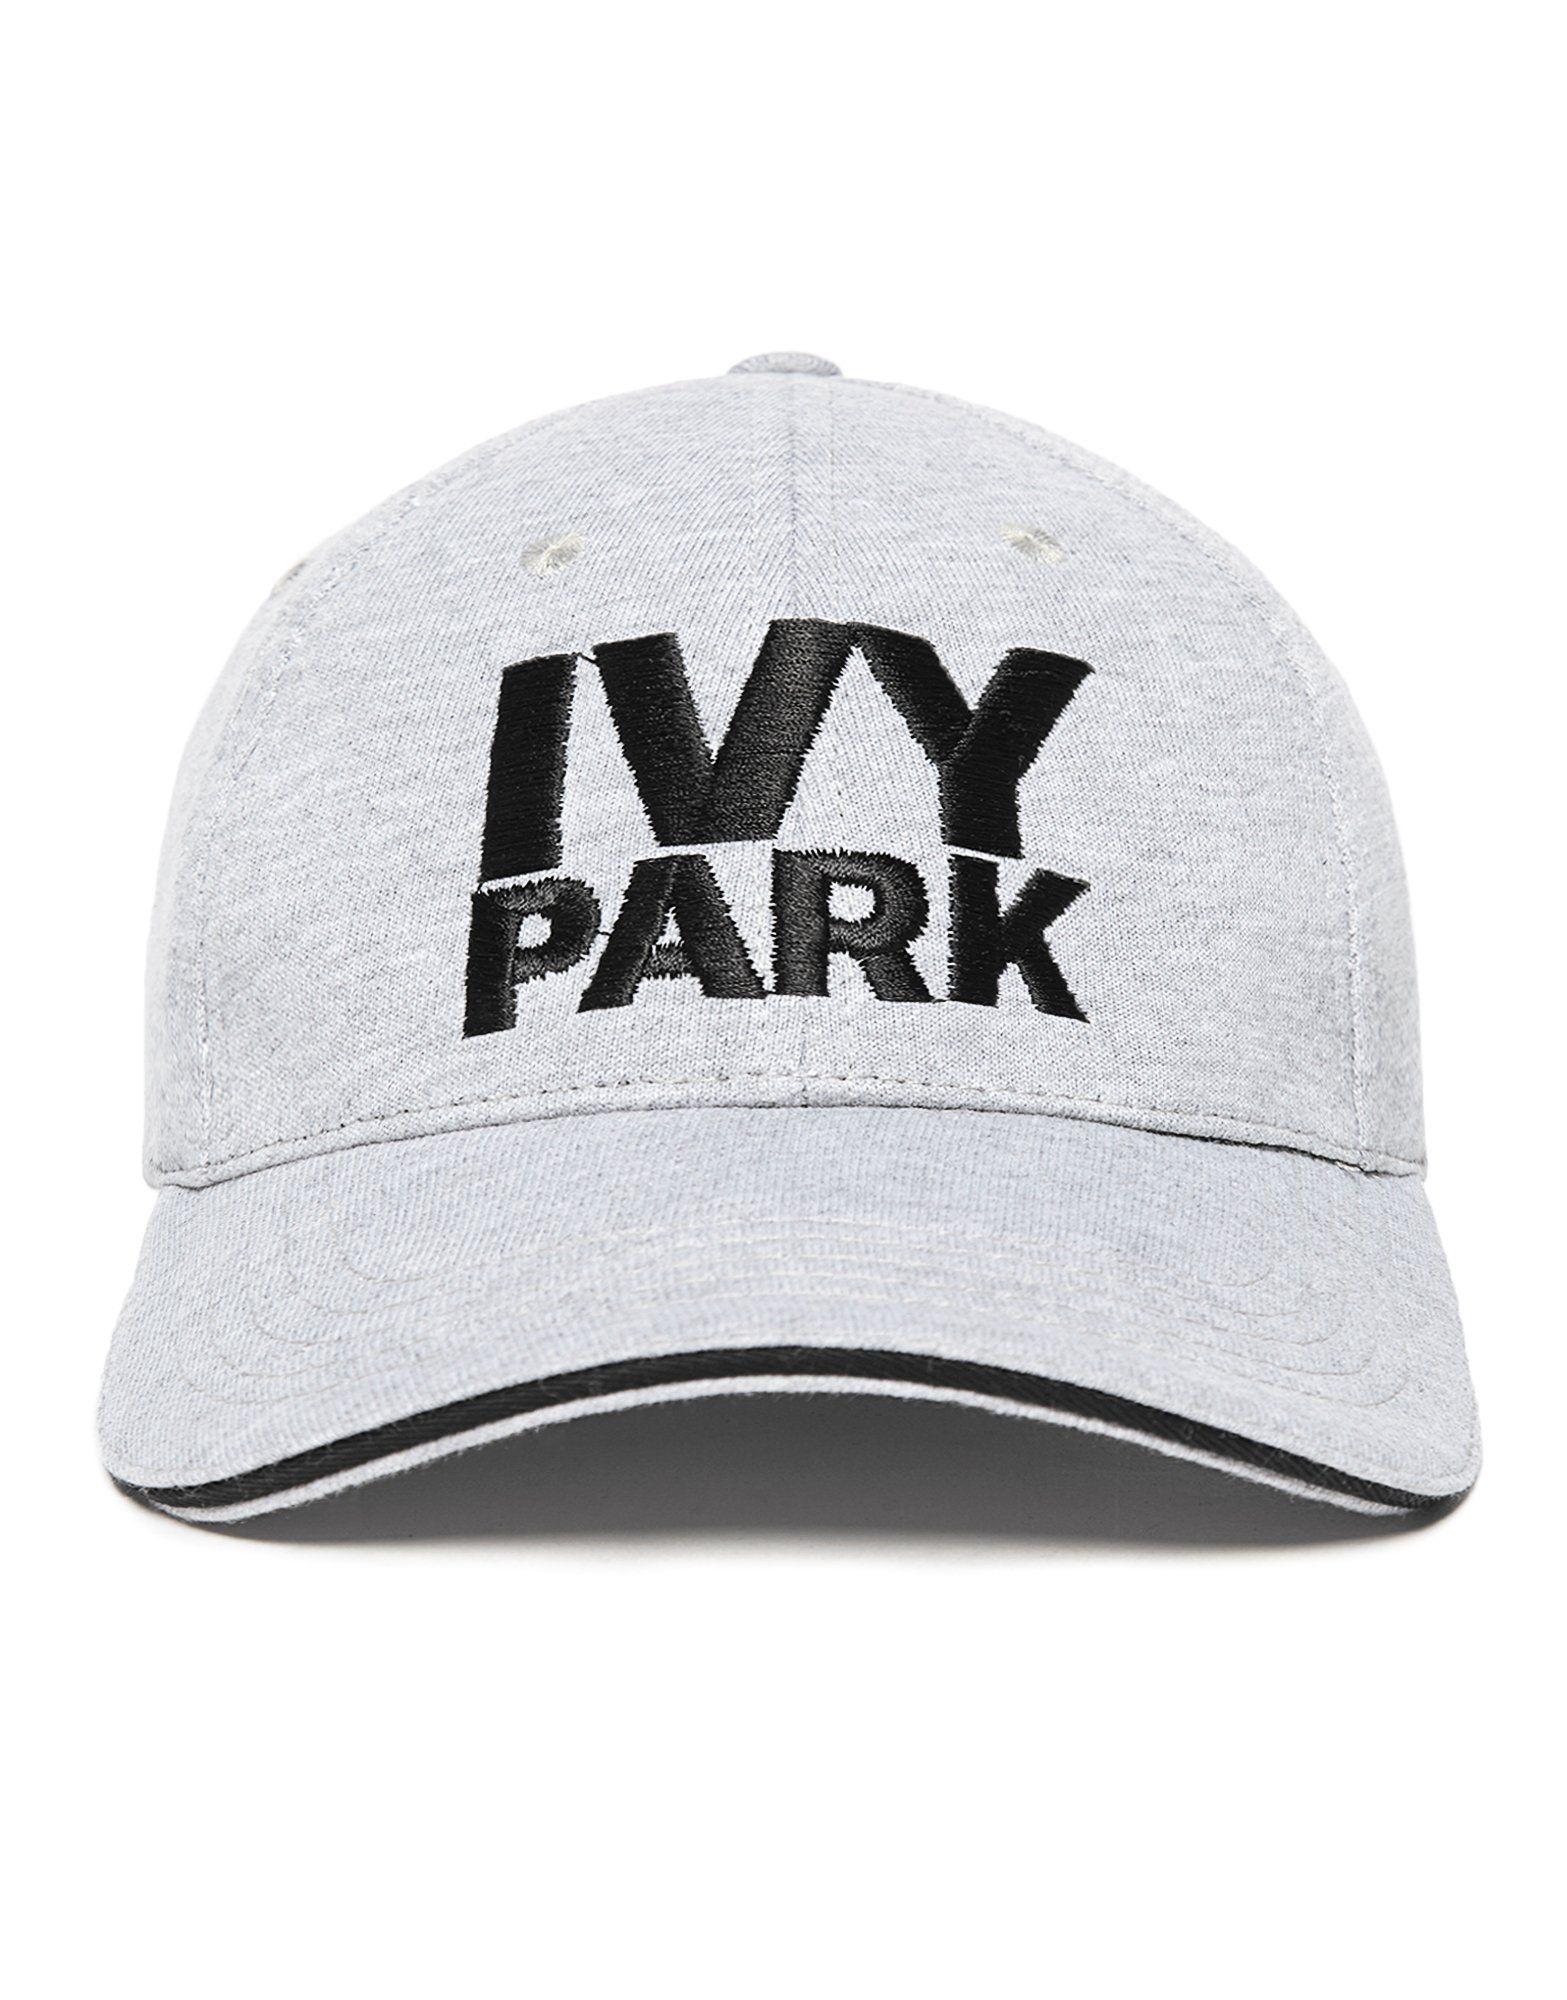 IVY PARK Baseball Cap